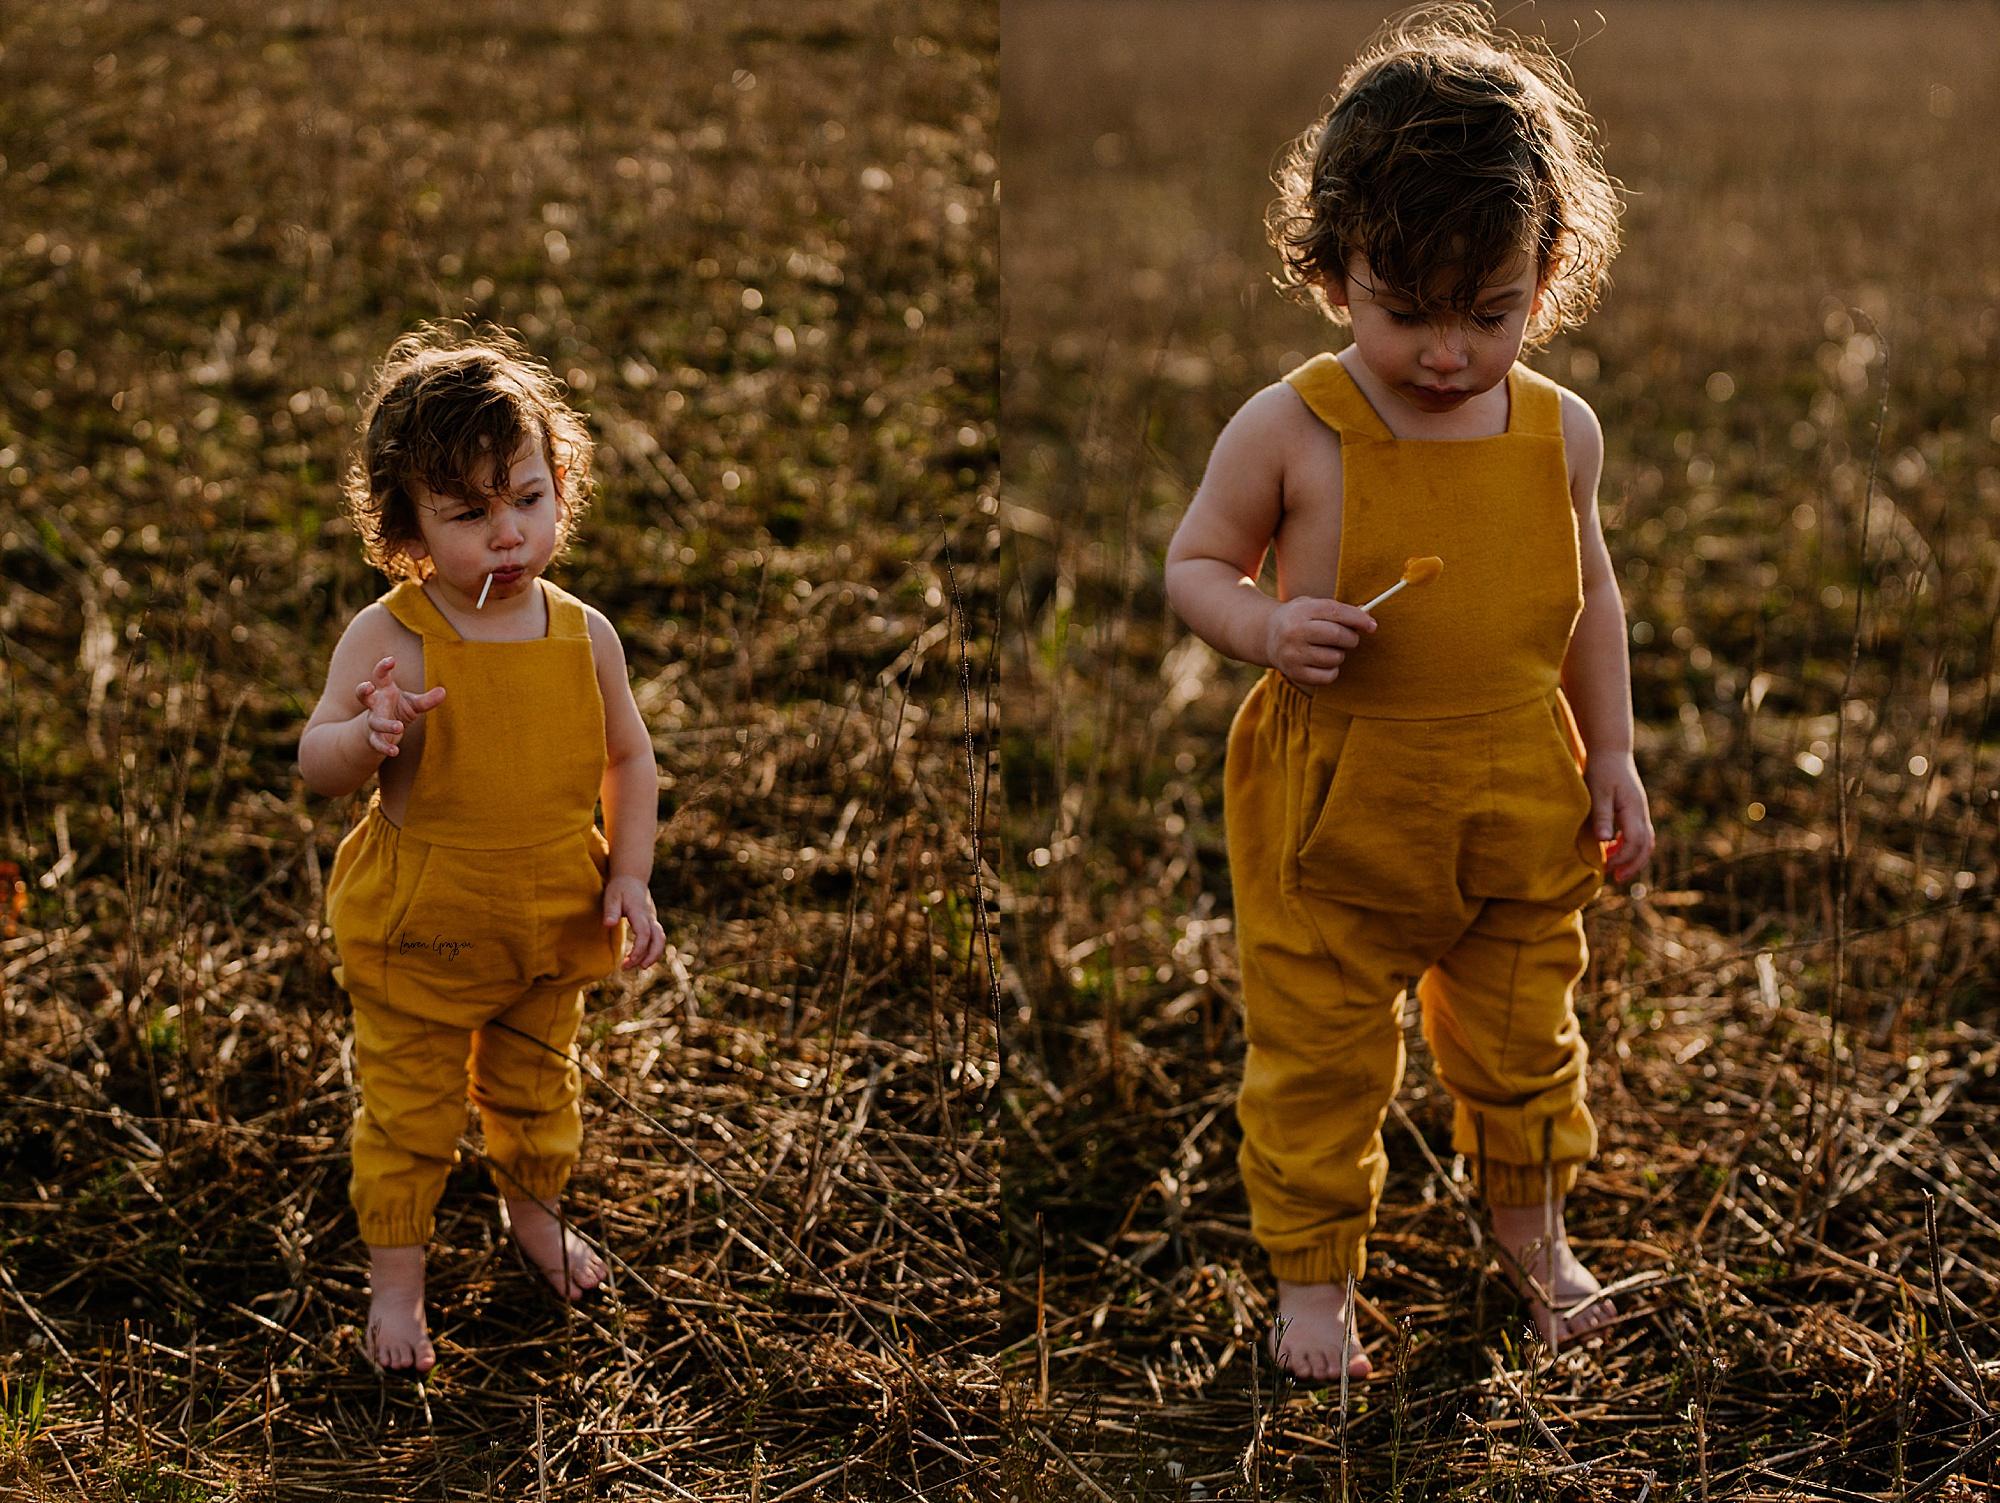 lauren-grayson-photography-akron-ohio-family-mom-boys-field-spring-outdoor-session_0025.jpg